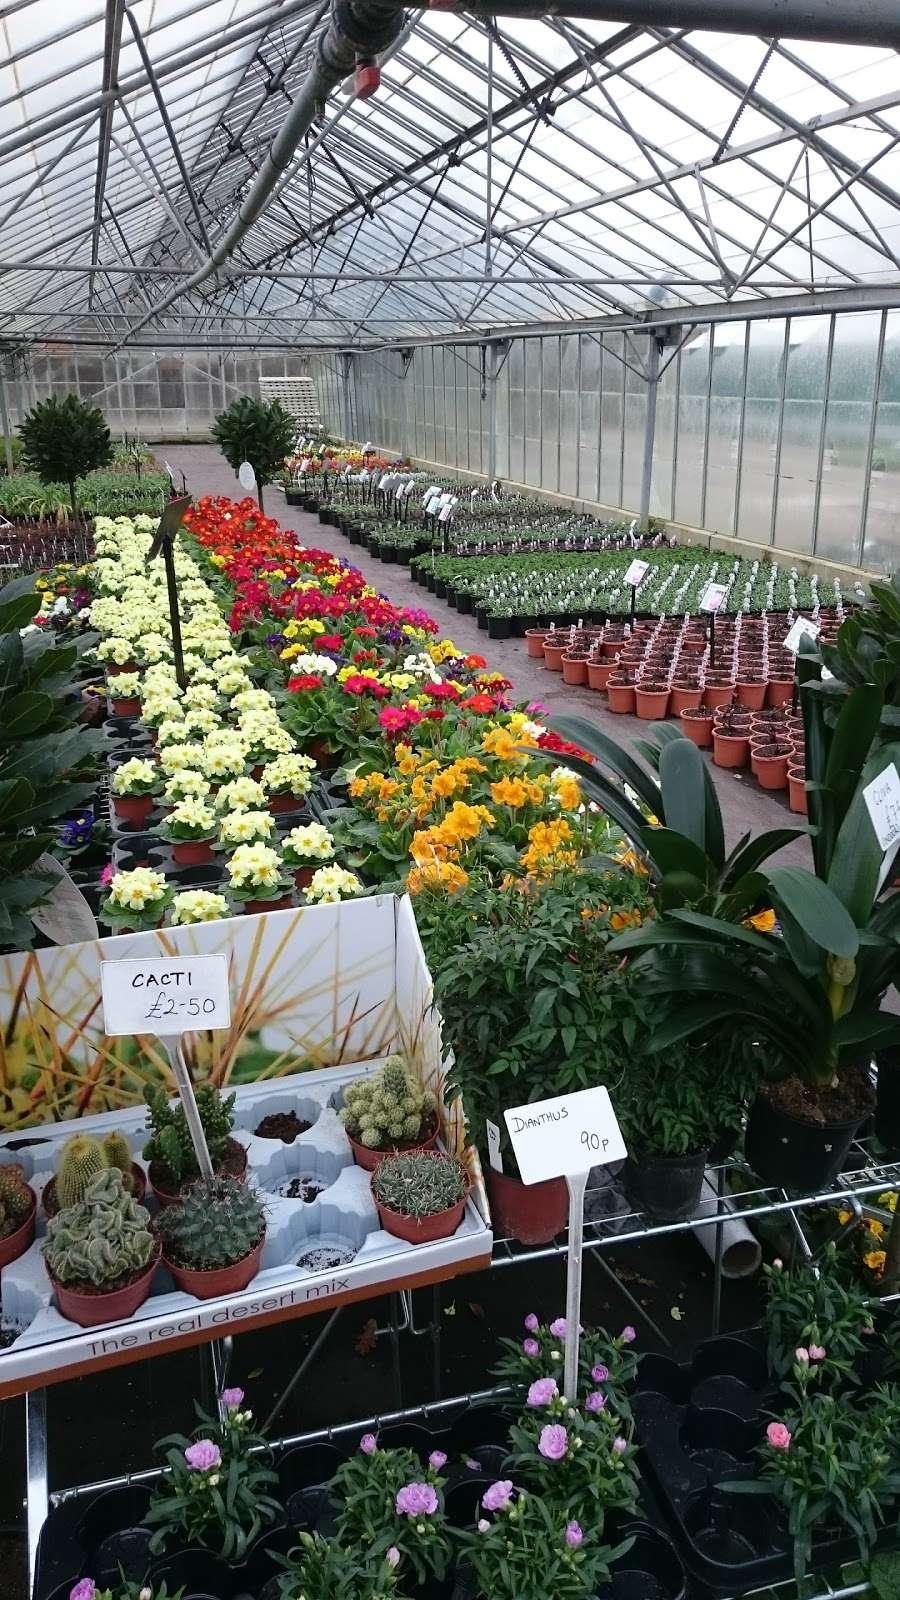 Matthews Plants - store  | Photo 9 of 10 | Address: Hadley Nursery, Tylers Rd, Roydon, Harlow CM19 5LJ, UK | Phone: 01279 793539